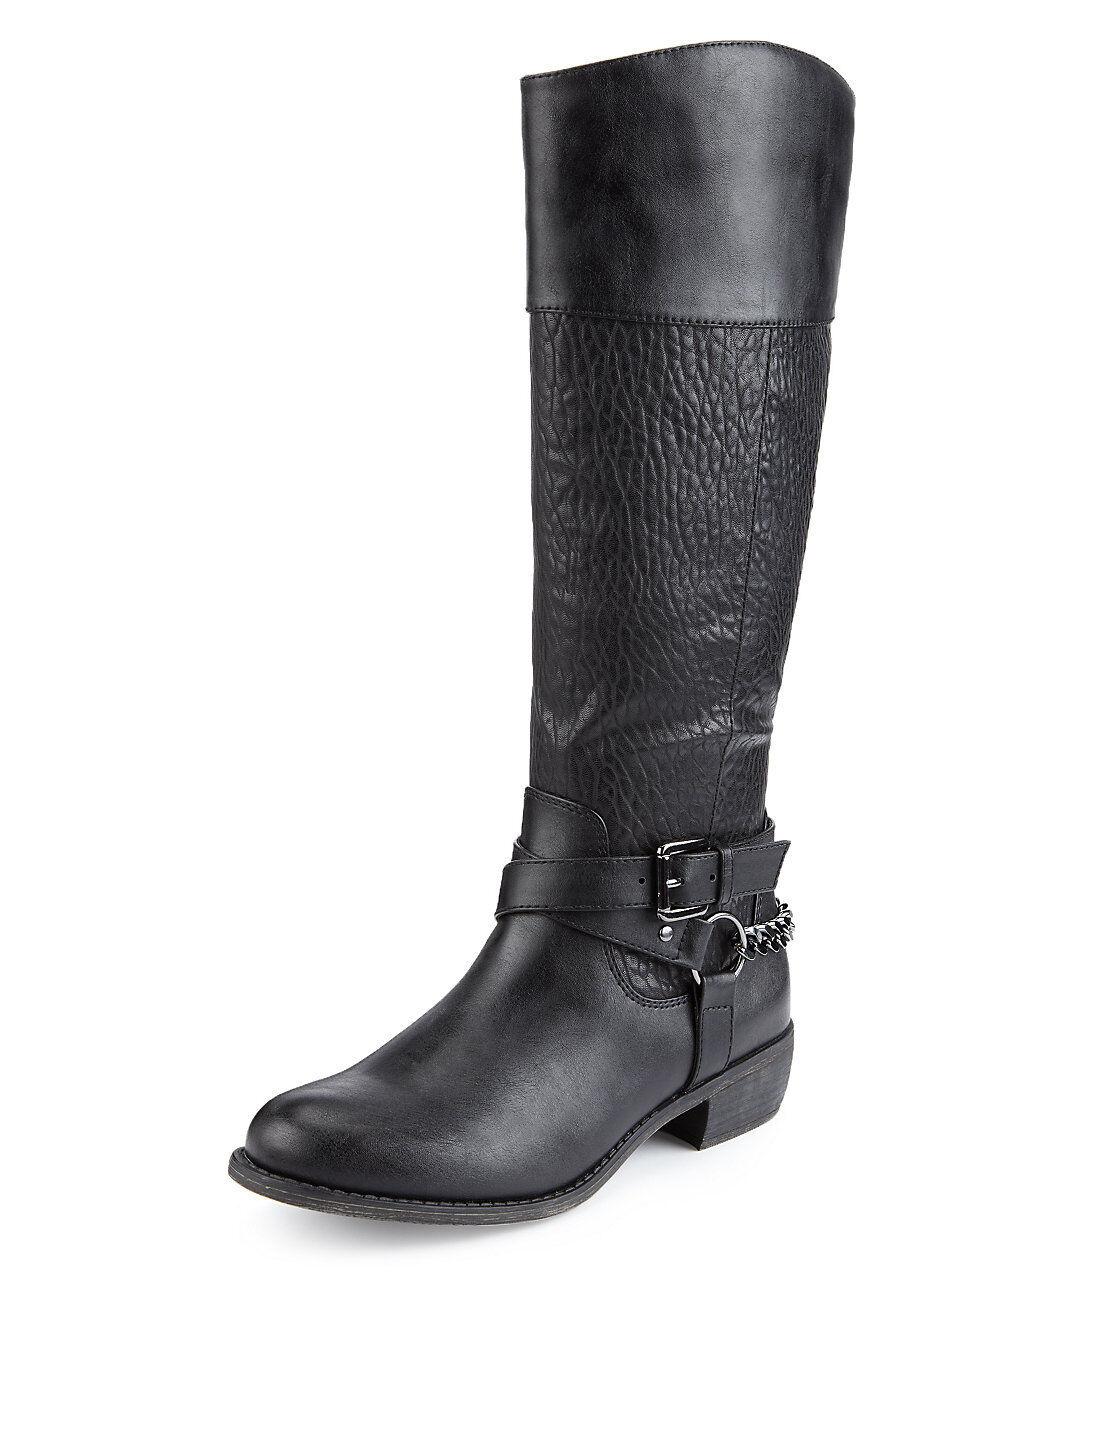 M&S Arnés De Cadena Negra Elástico Rodilla Botas Zip Insolia con Insolia Zip Flex ® Talla e73785